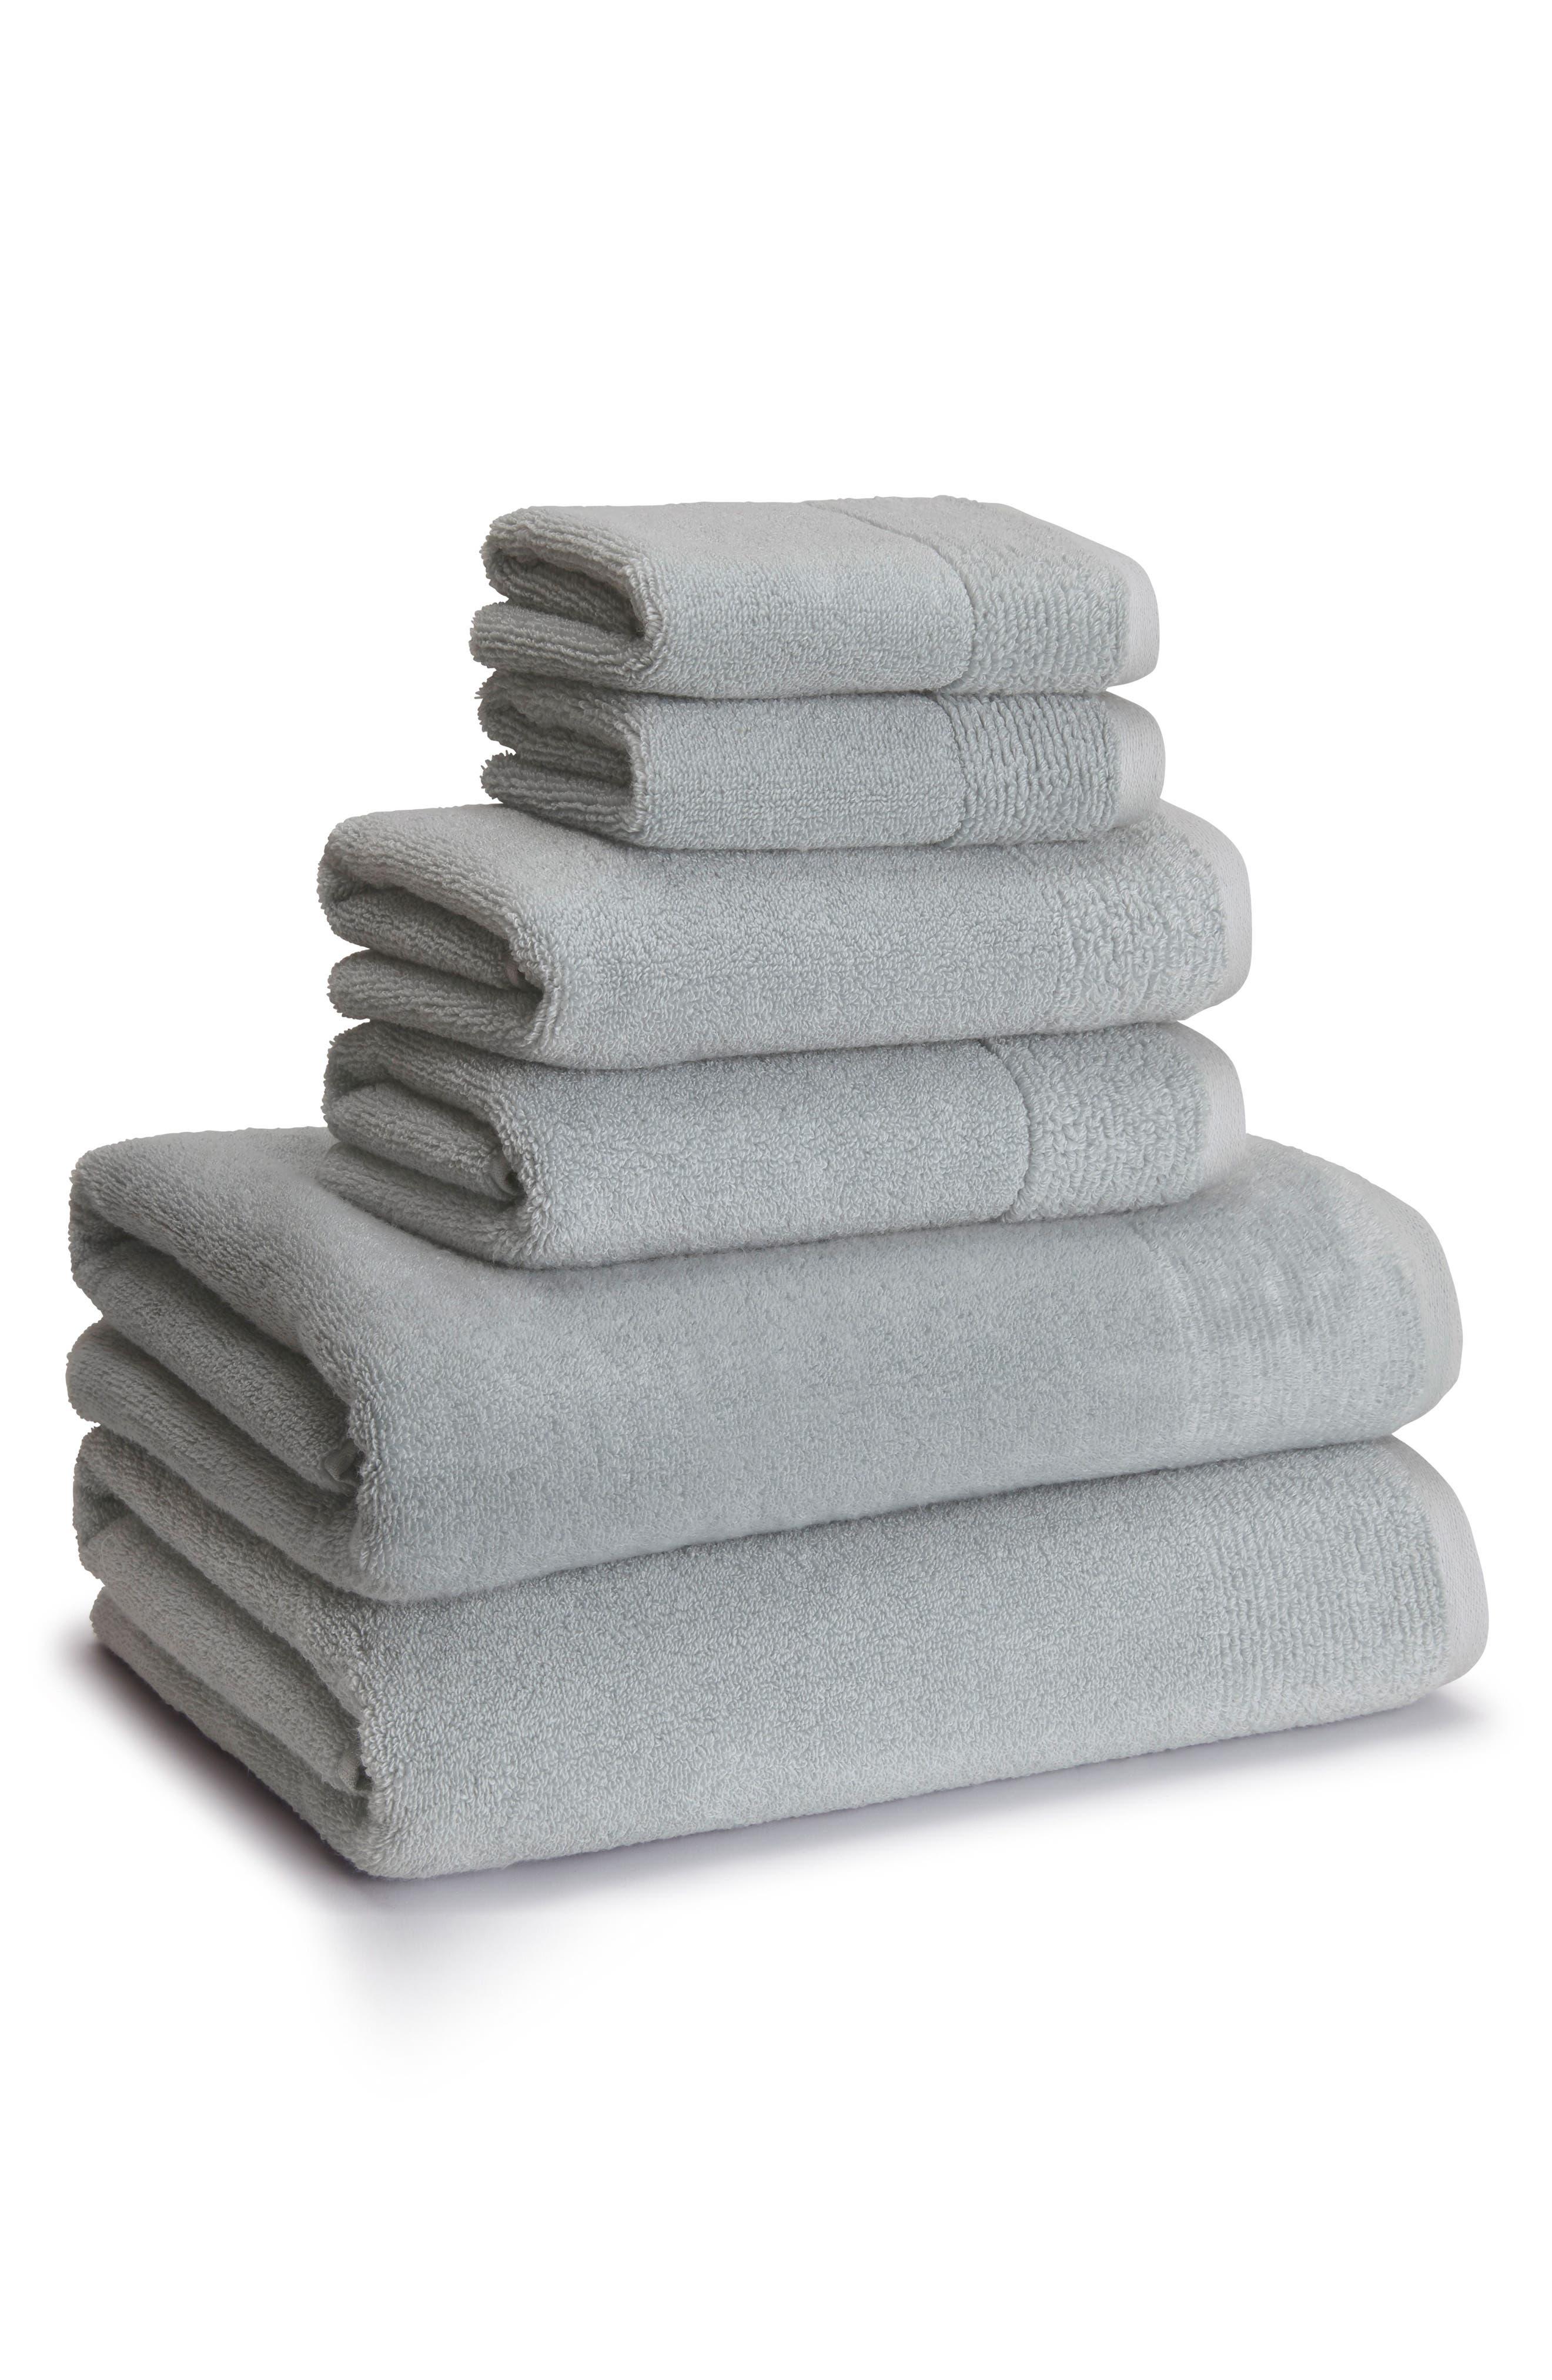 KASSATEX Kyoto Hand Towel